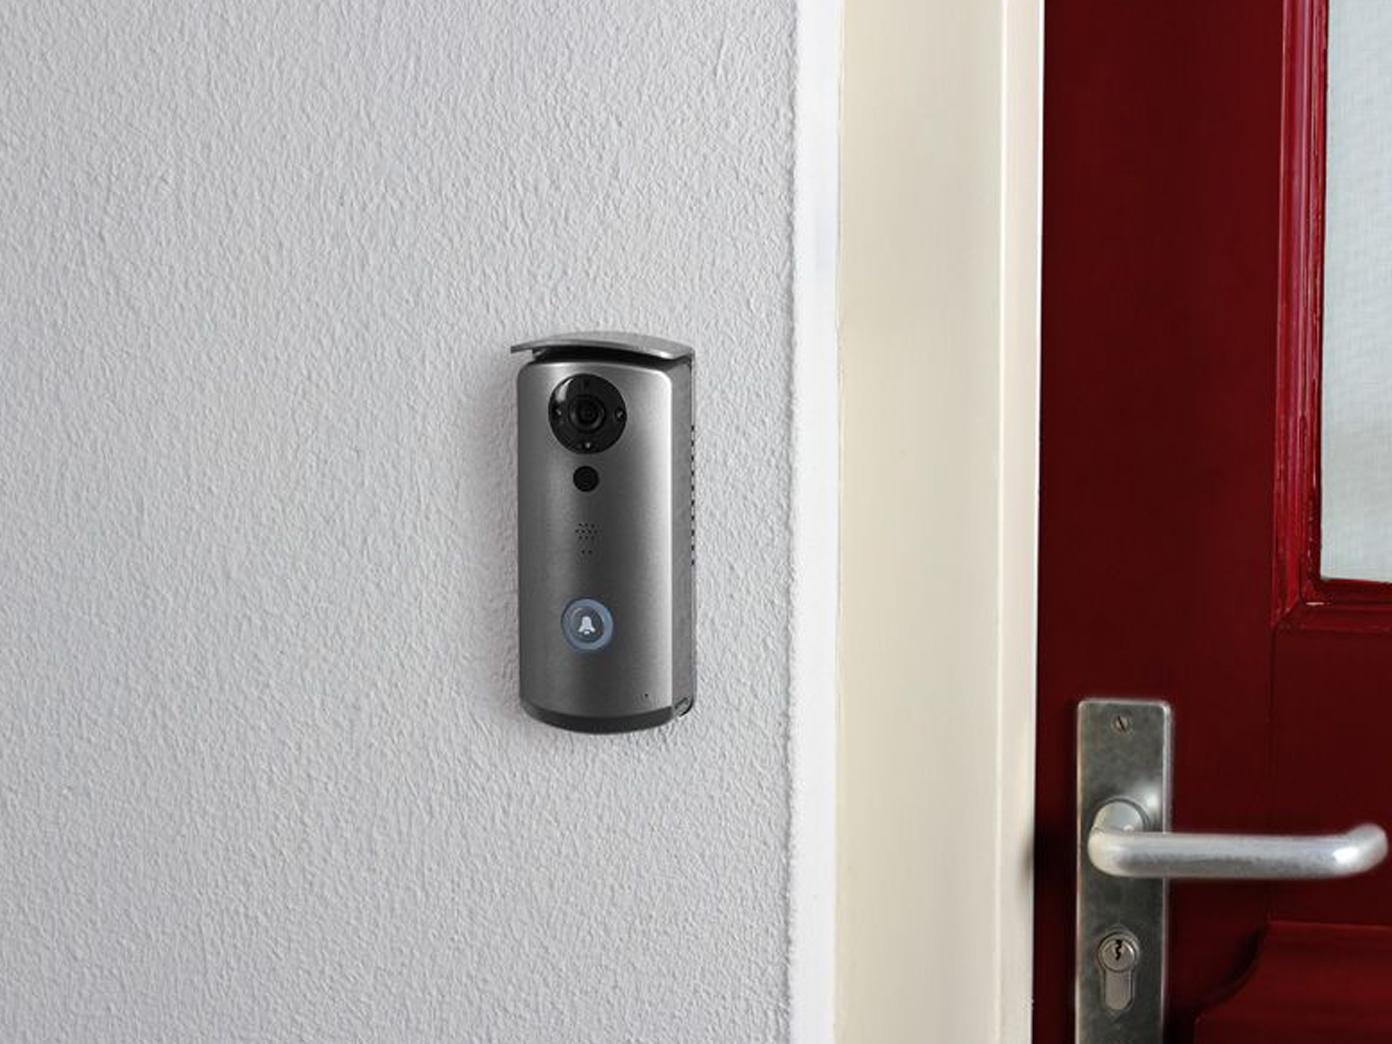 t ranlage hausklingel mit kamera videosprechanlage 2 draht. Black Bedroom Furniture Sets. Home Design Ideas